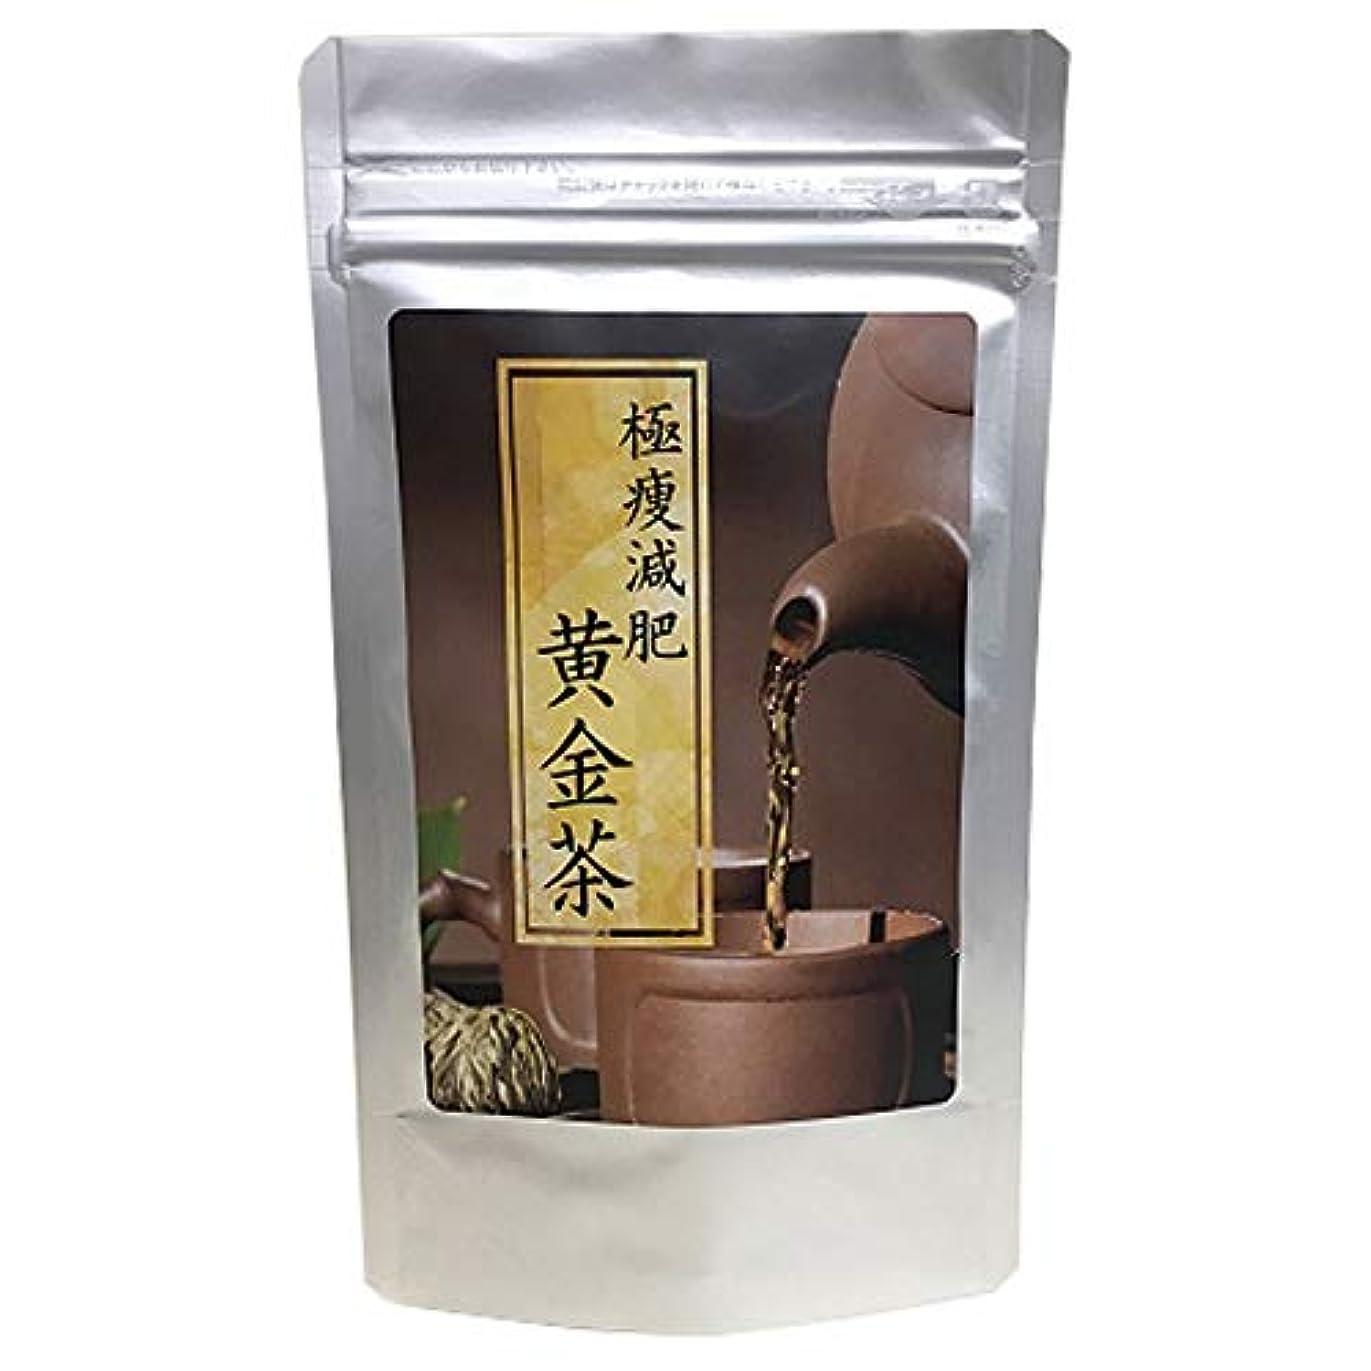 コック平和的必需品極痩減肥黄金茶